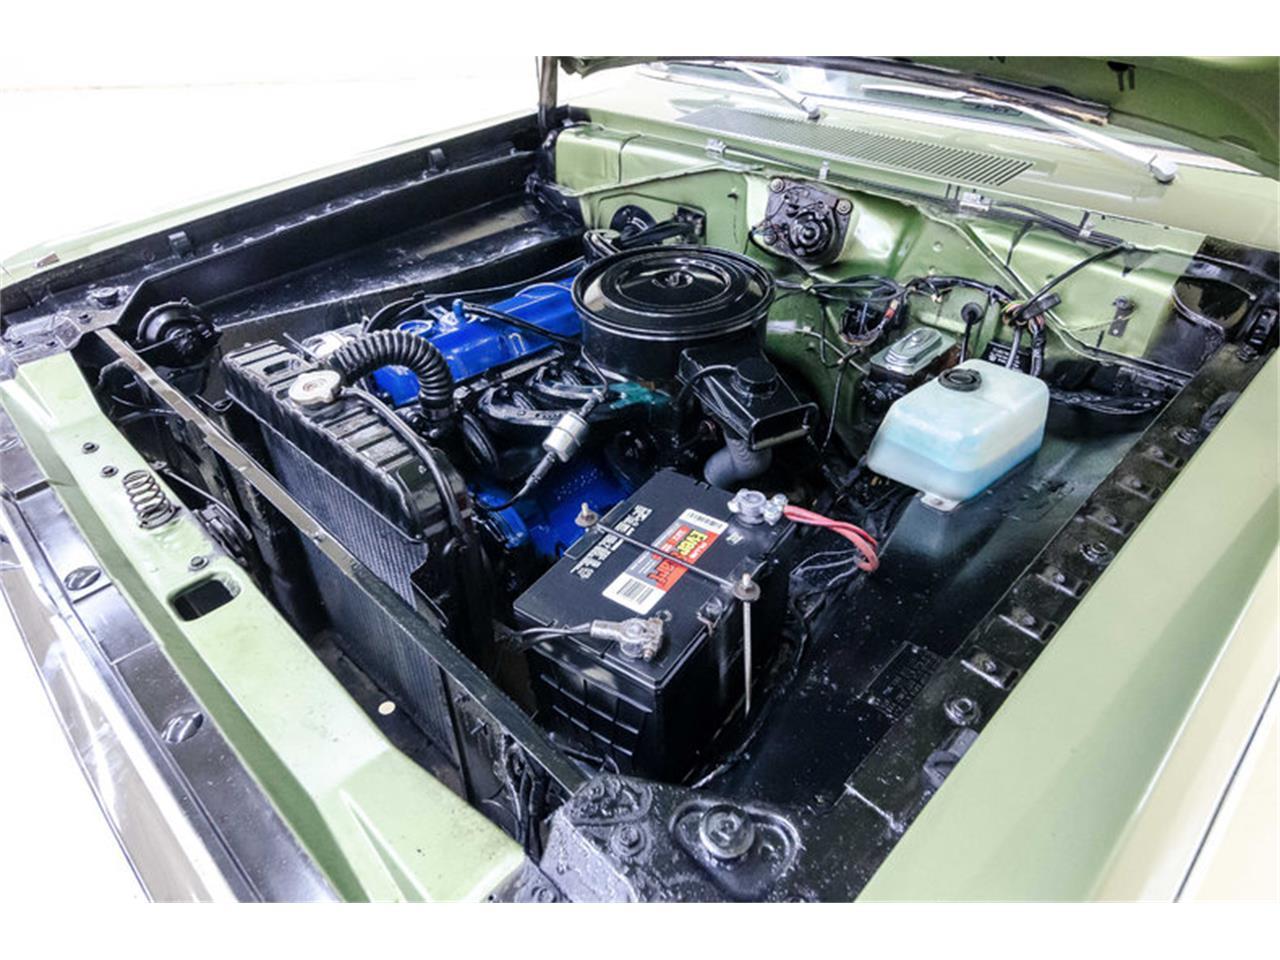 Large Picture of '70 Dodge Dart located in Concord North Carolina - $12,995.00 - LASI